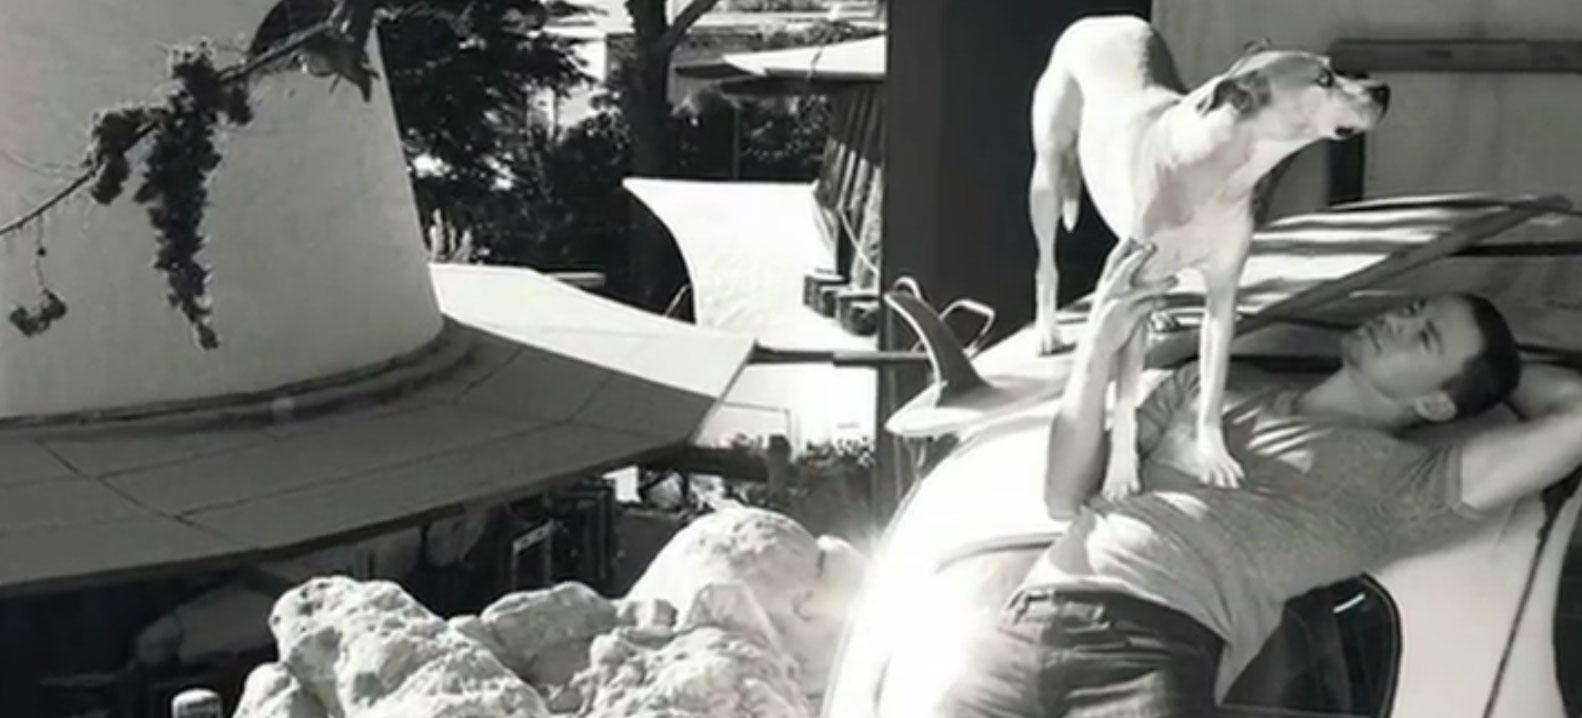 ChanningTatum-Details-BehindTheScenes-09.jpg